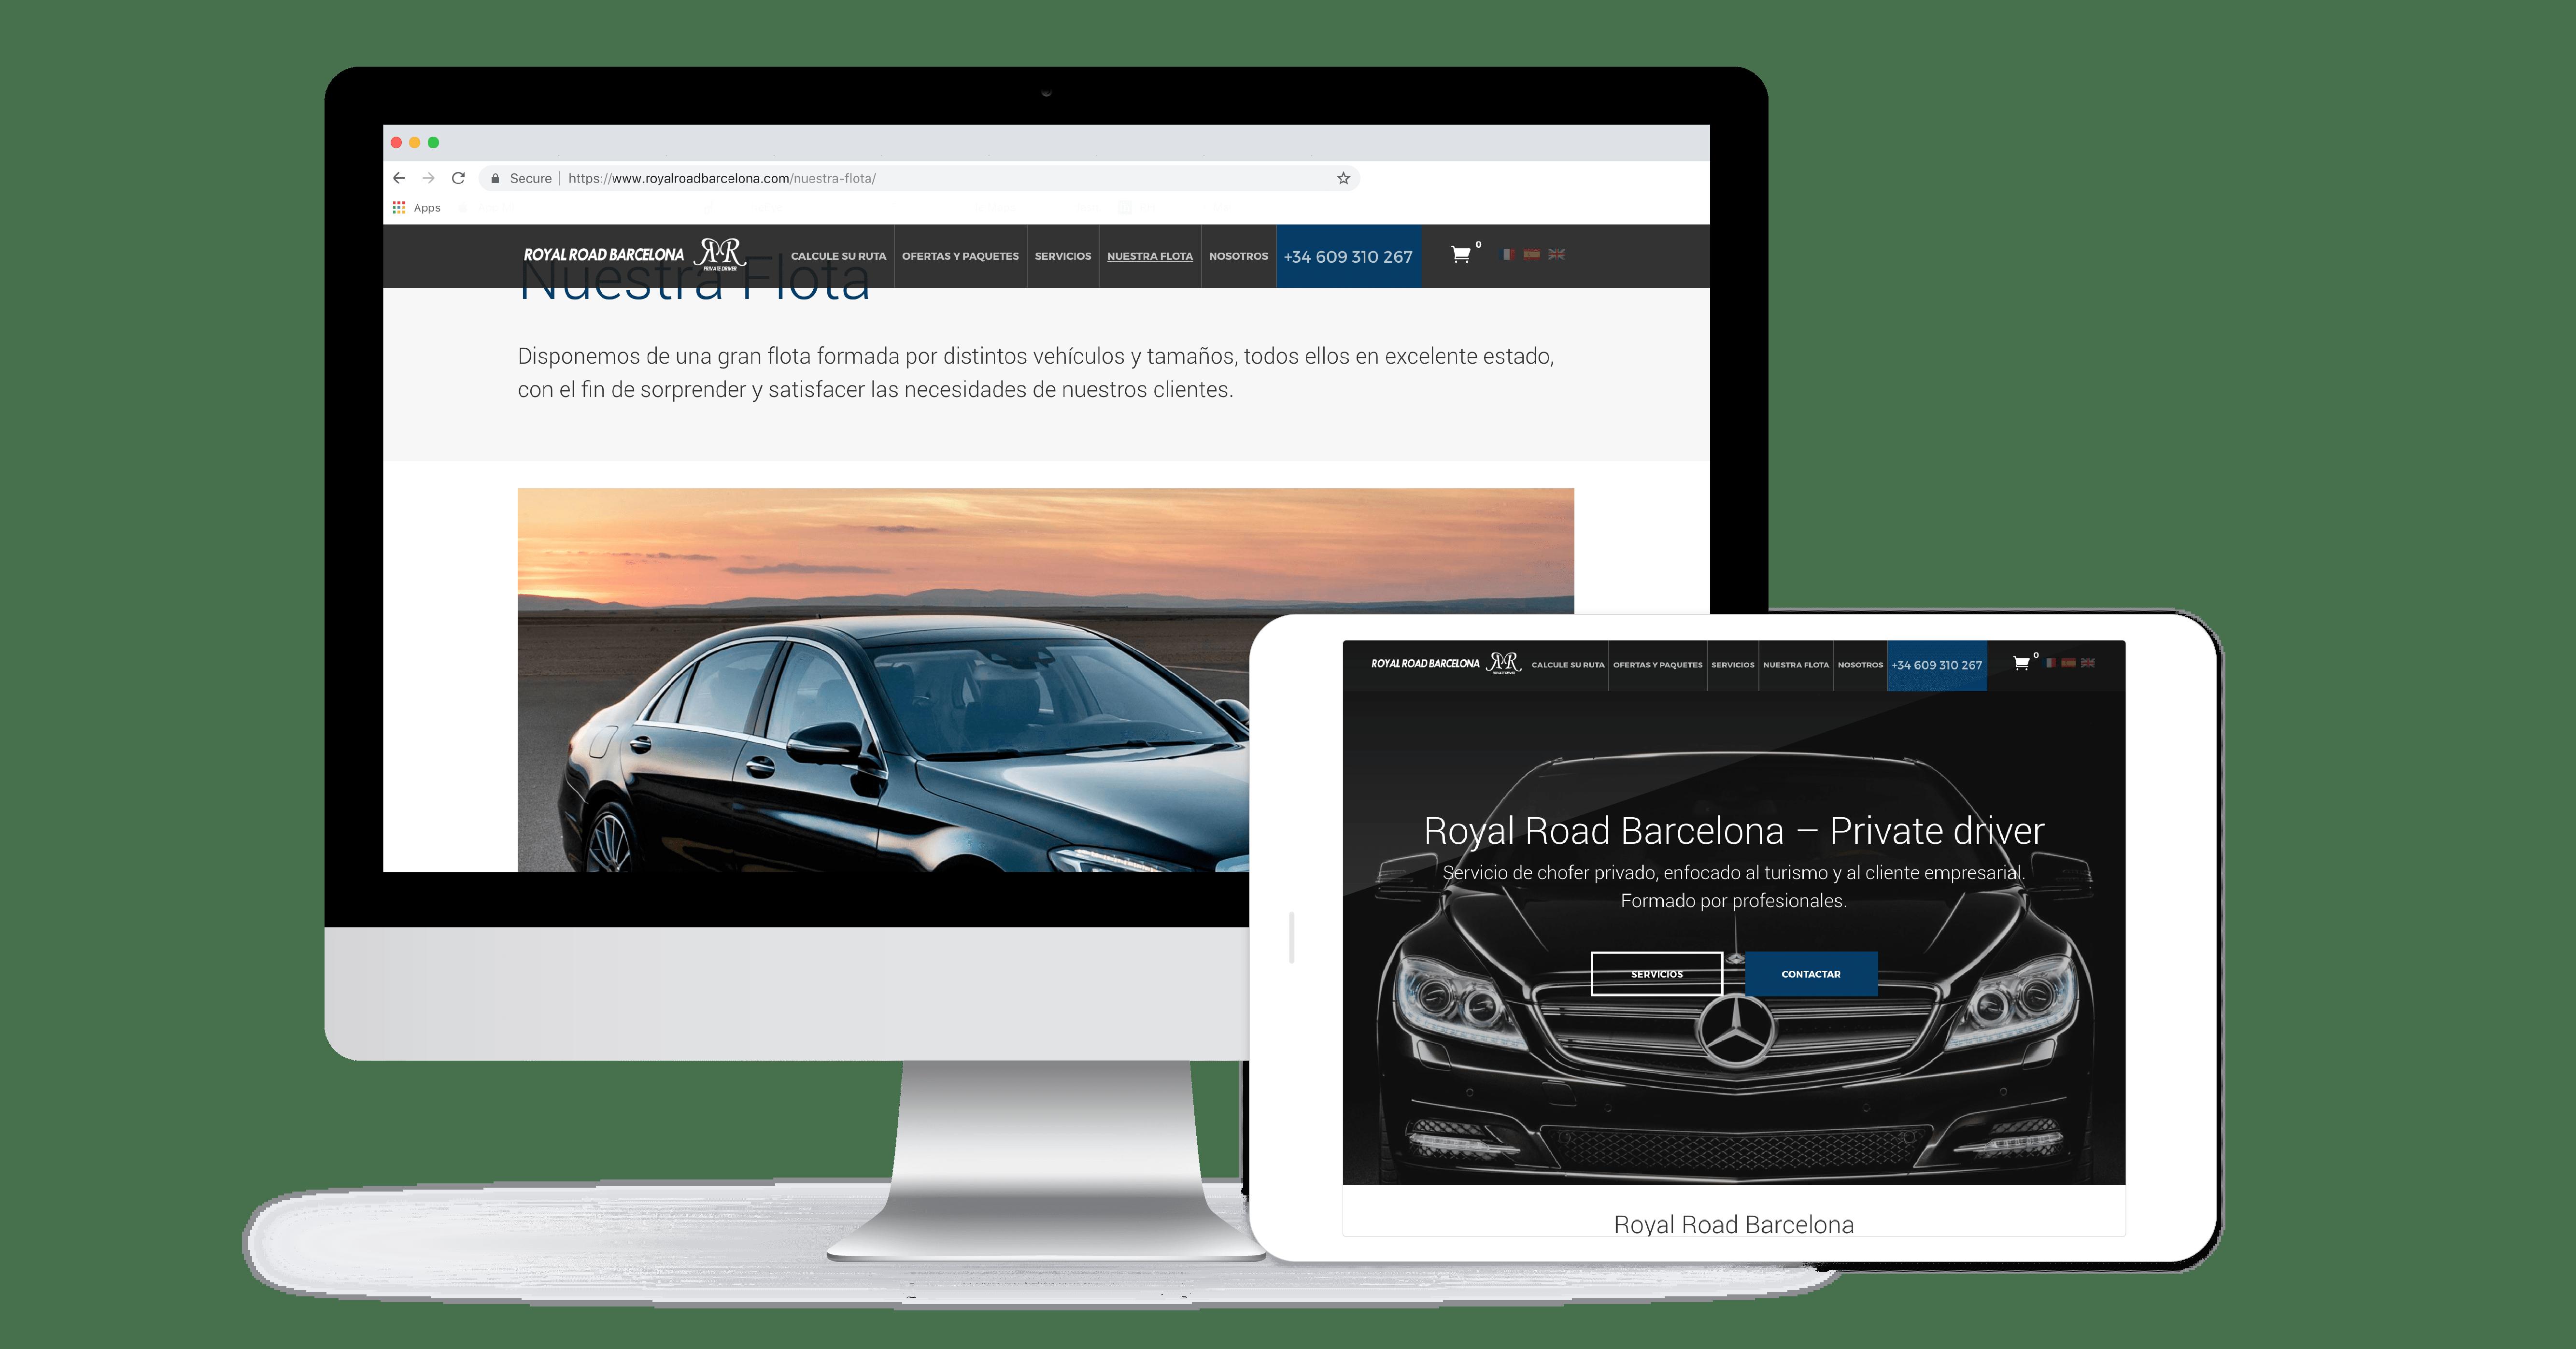 Casos éxito etlinebcn_web_Royal-road